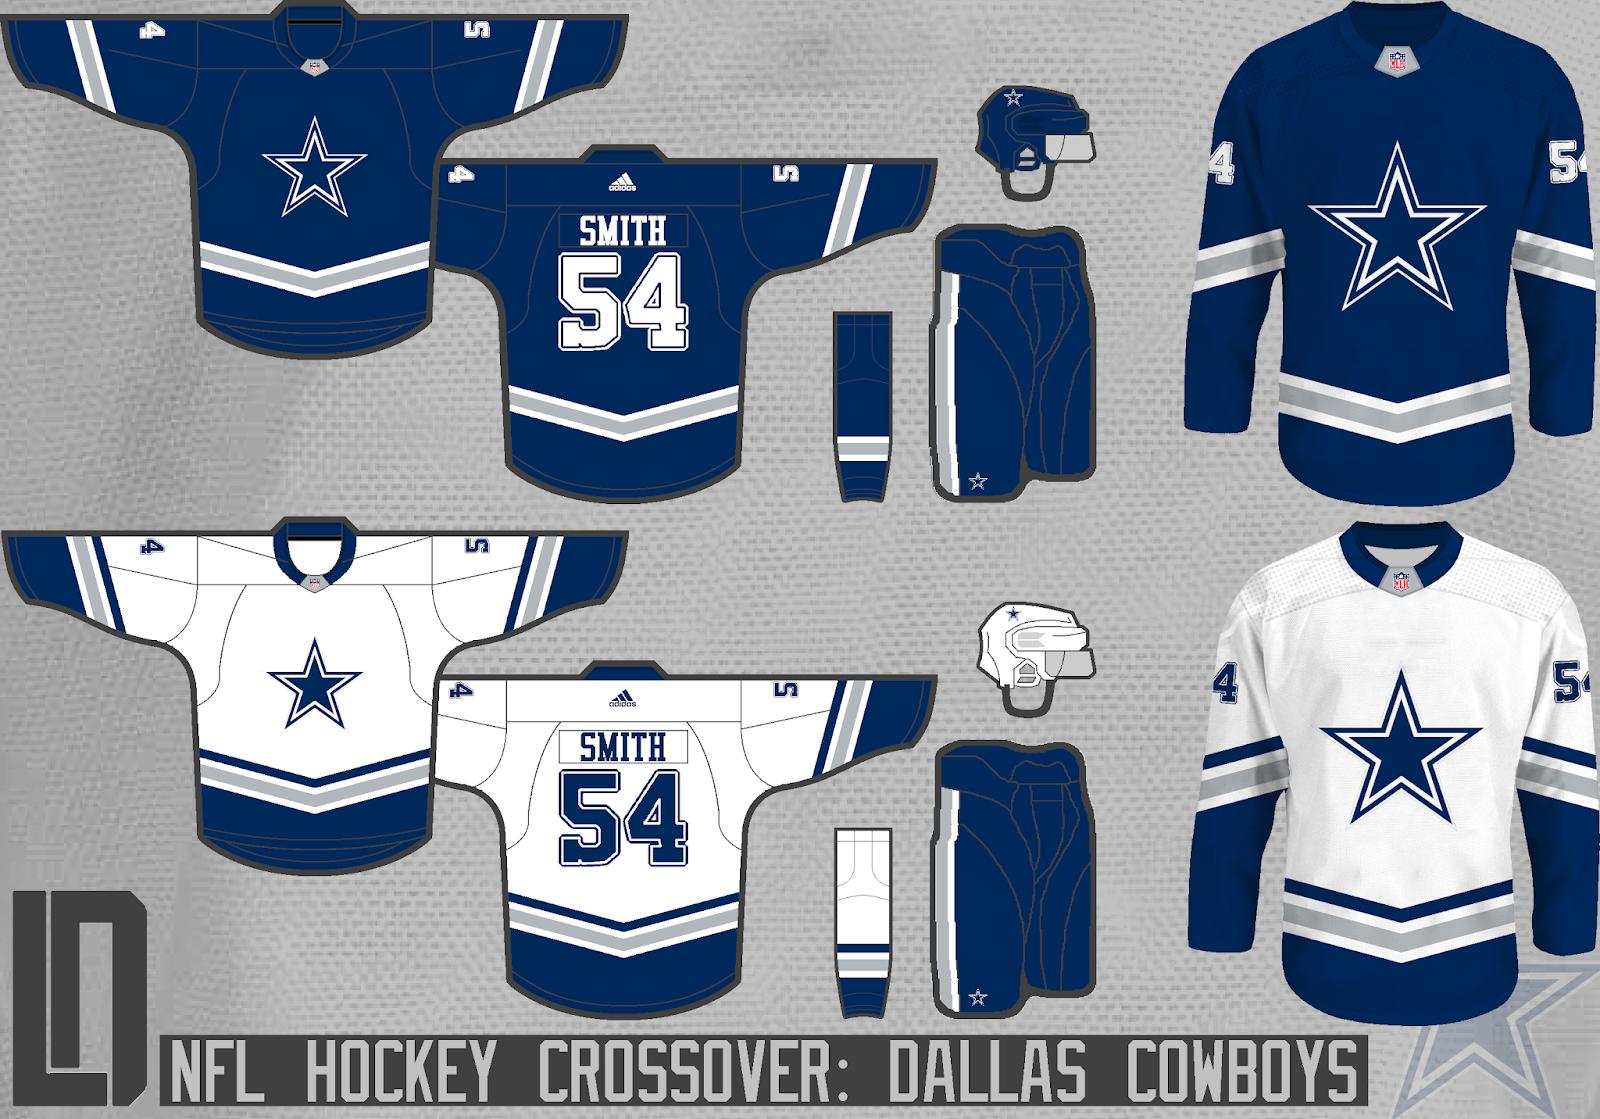 Dallas+Cowboys+Concept.png